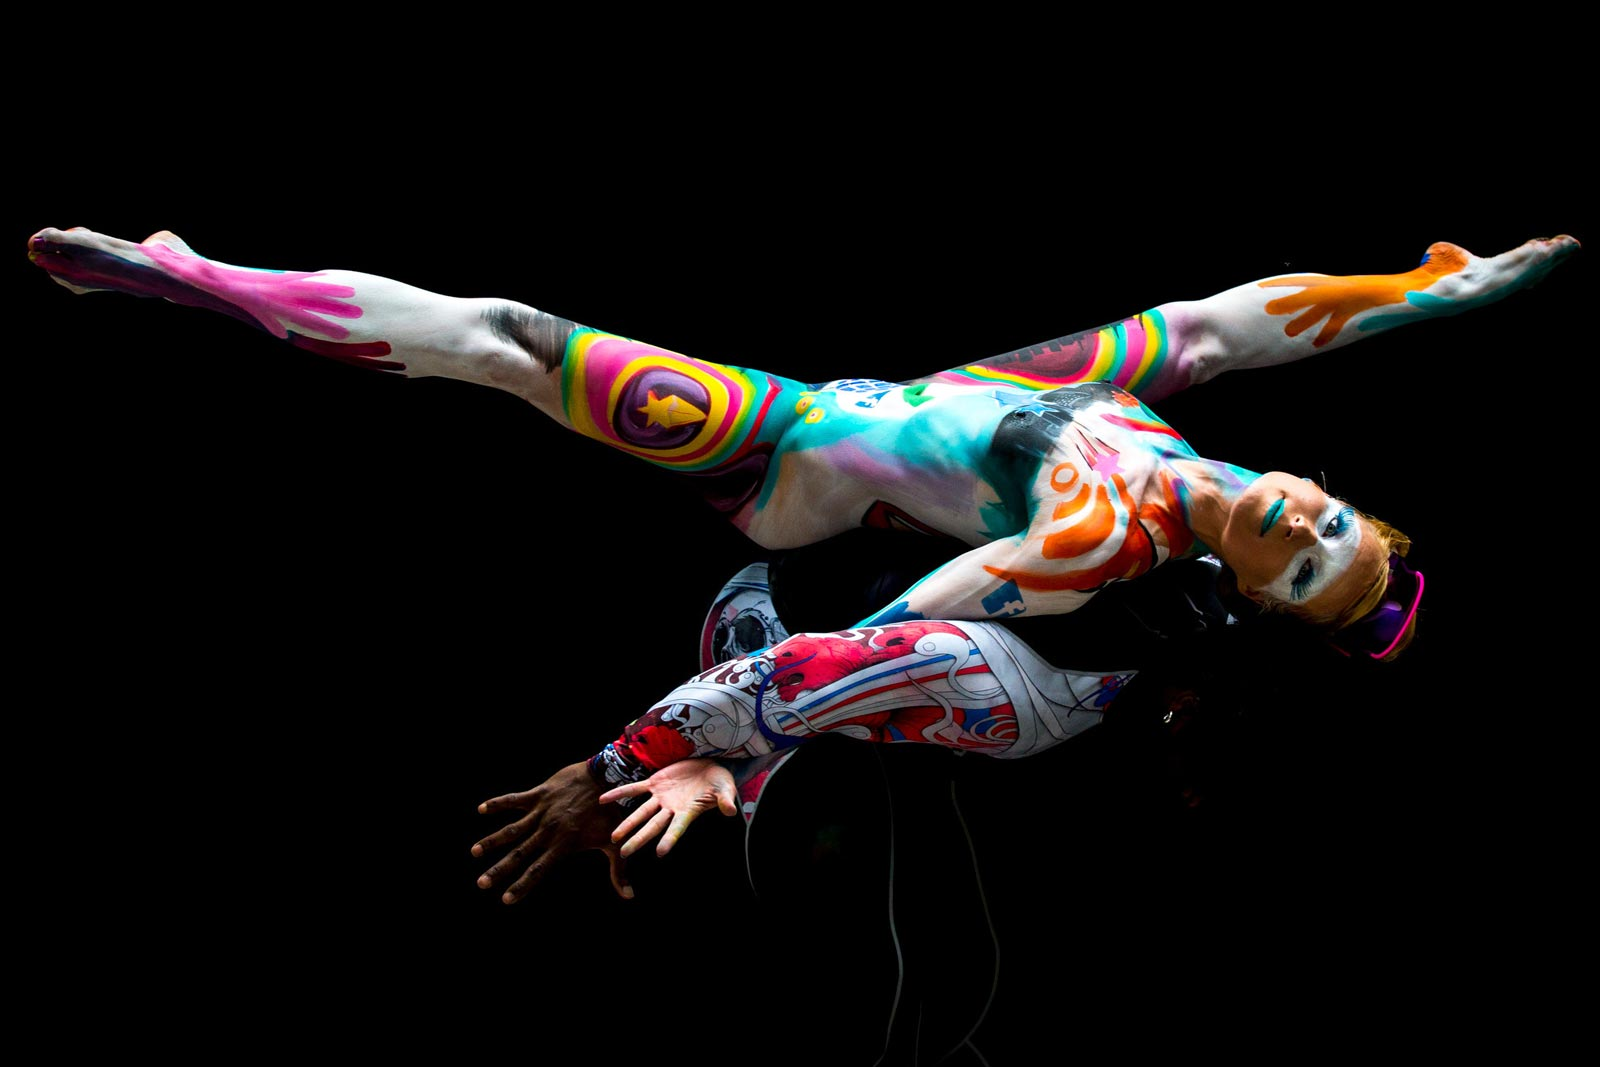 naked women superher body paint